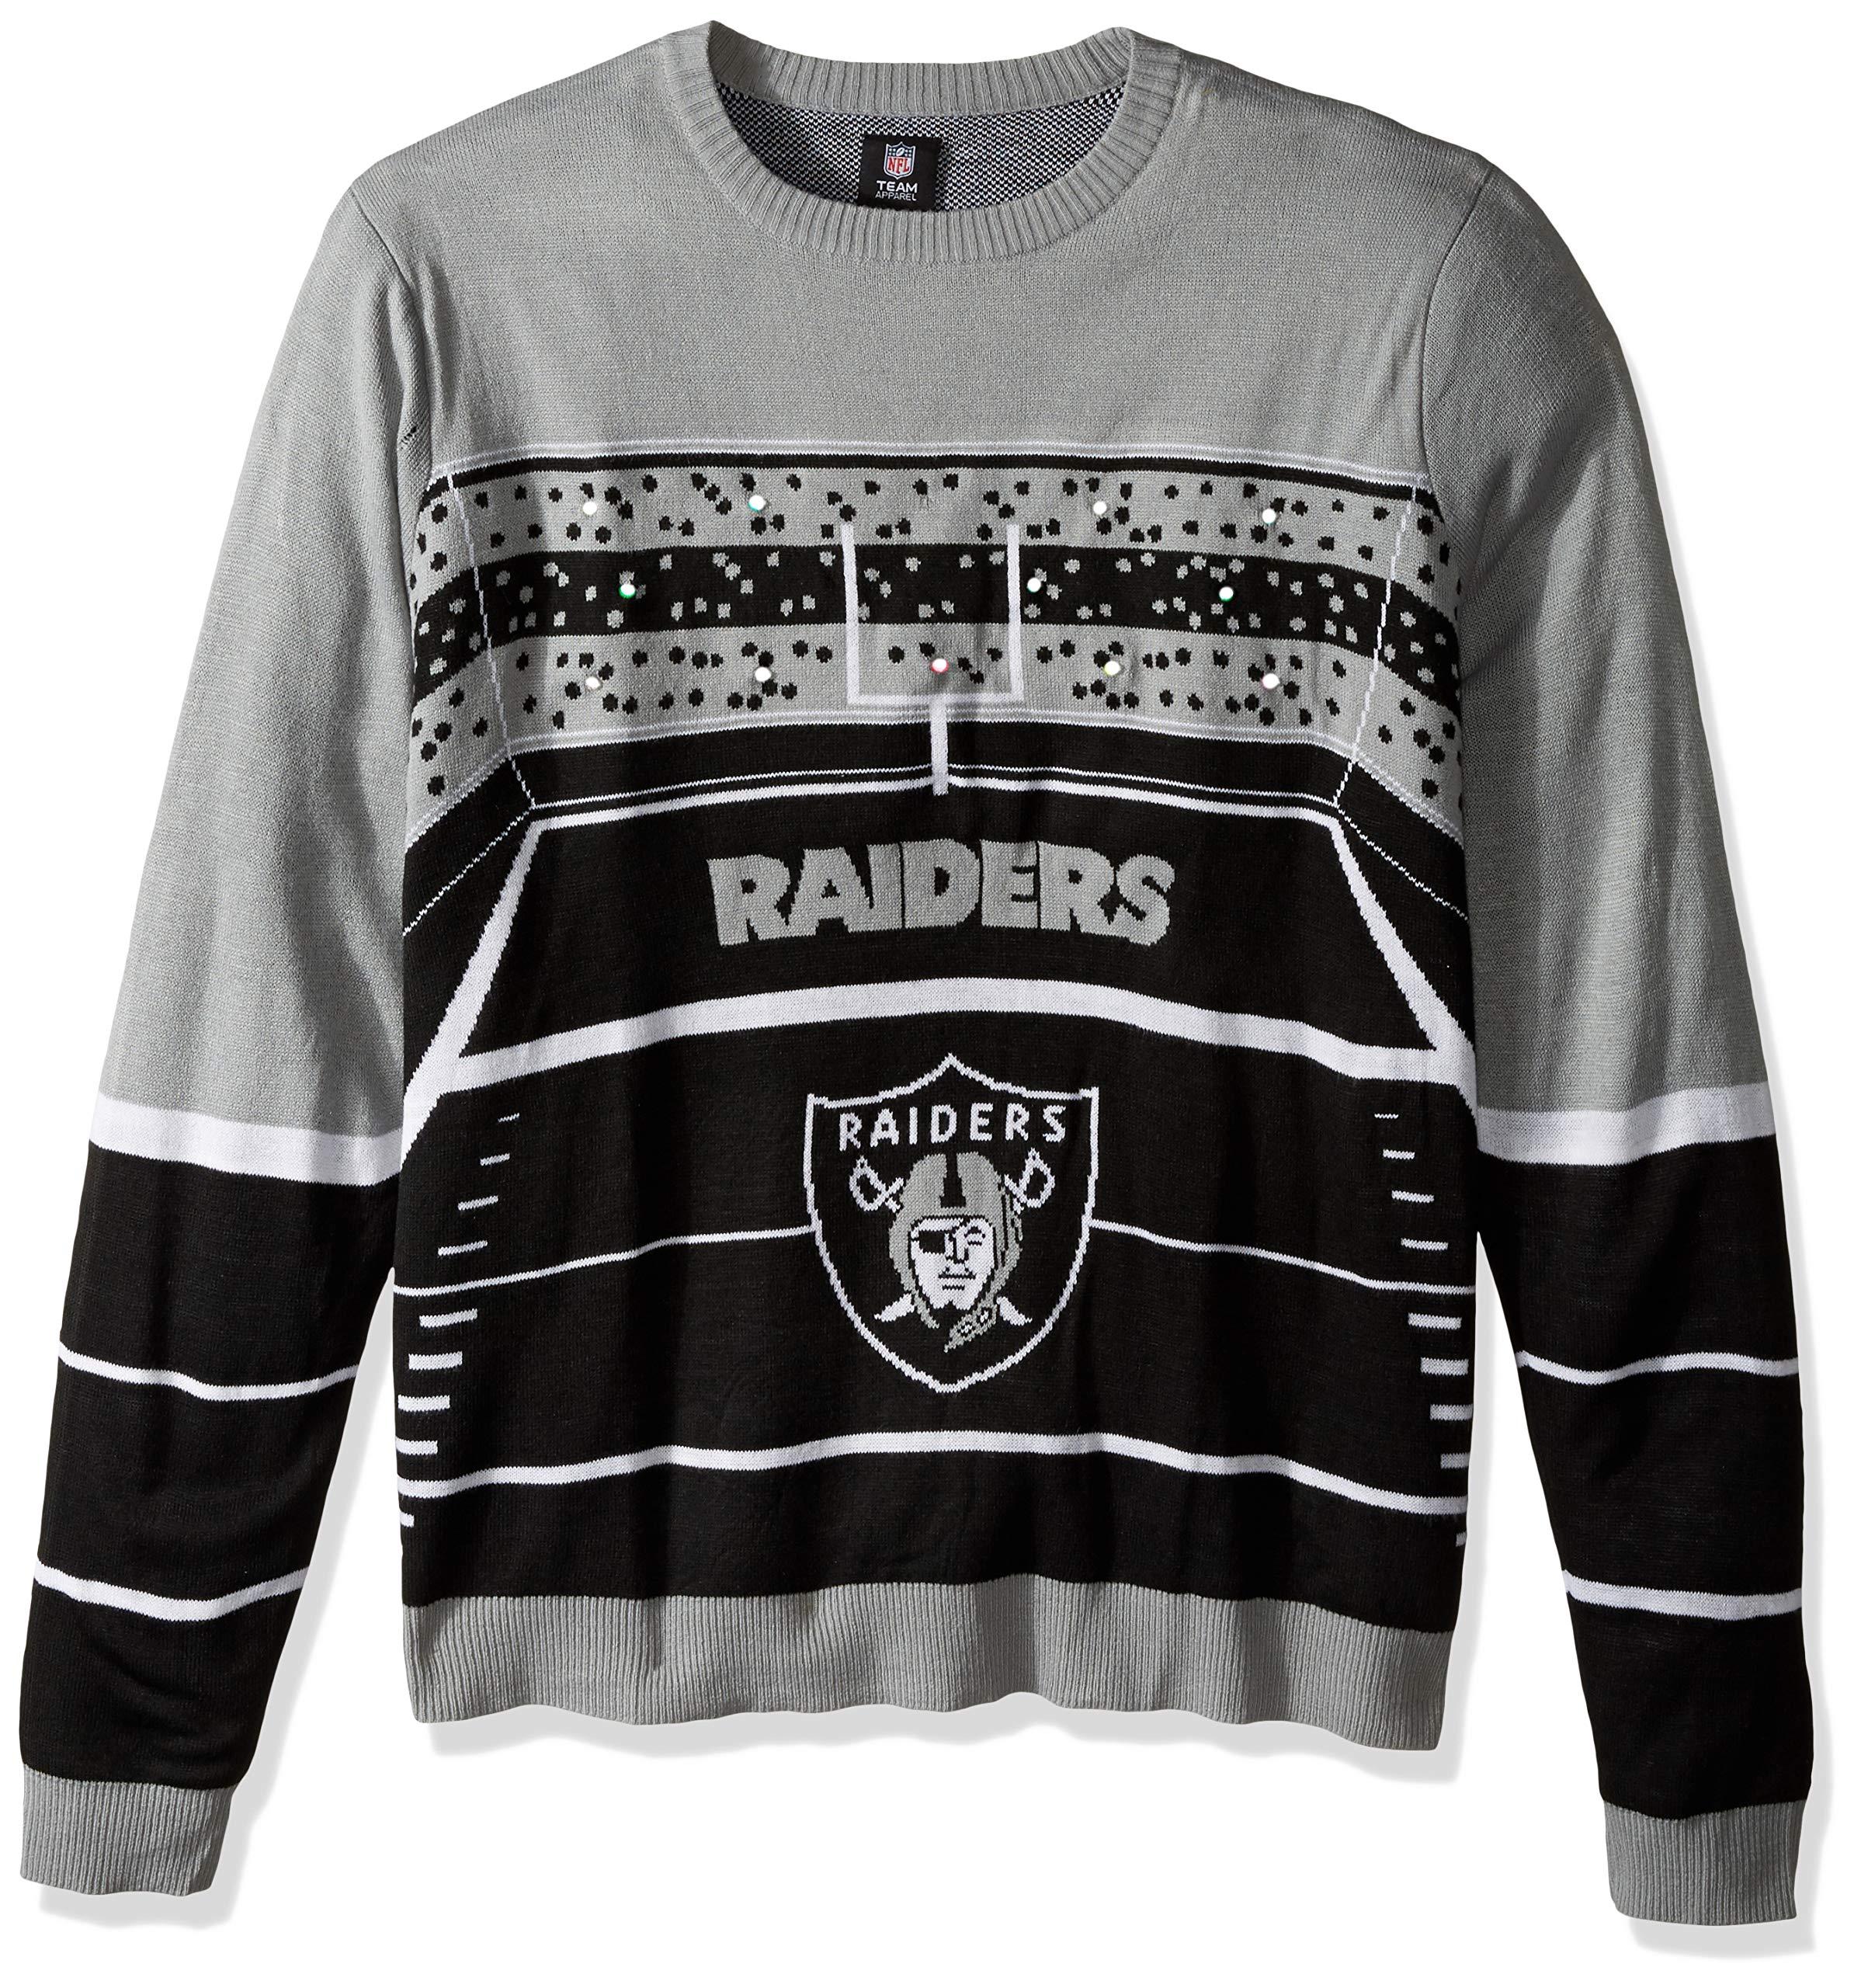 FOCO SWTCNNFSTDLU NFL Oakland Raiders Mens Stadium Light Up Crew Neck Sweaterstadium Light Up Crew Neck Sweater, Team Color, XX-Large